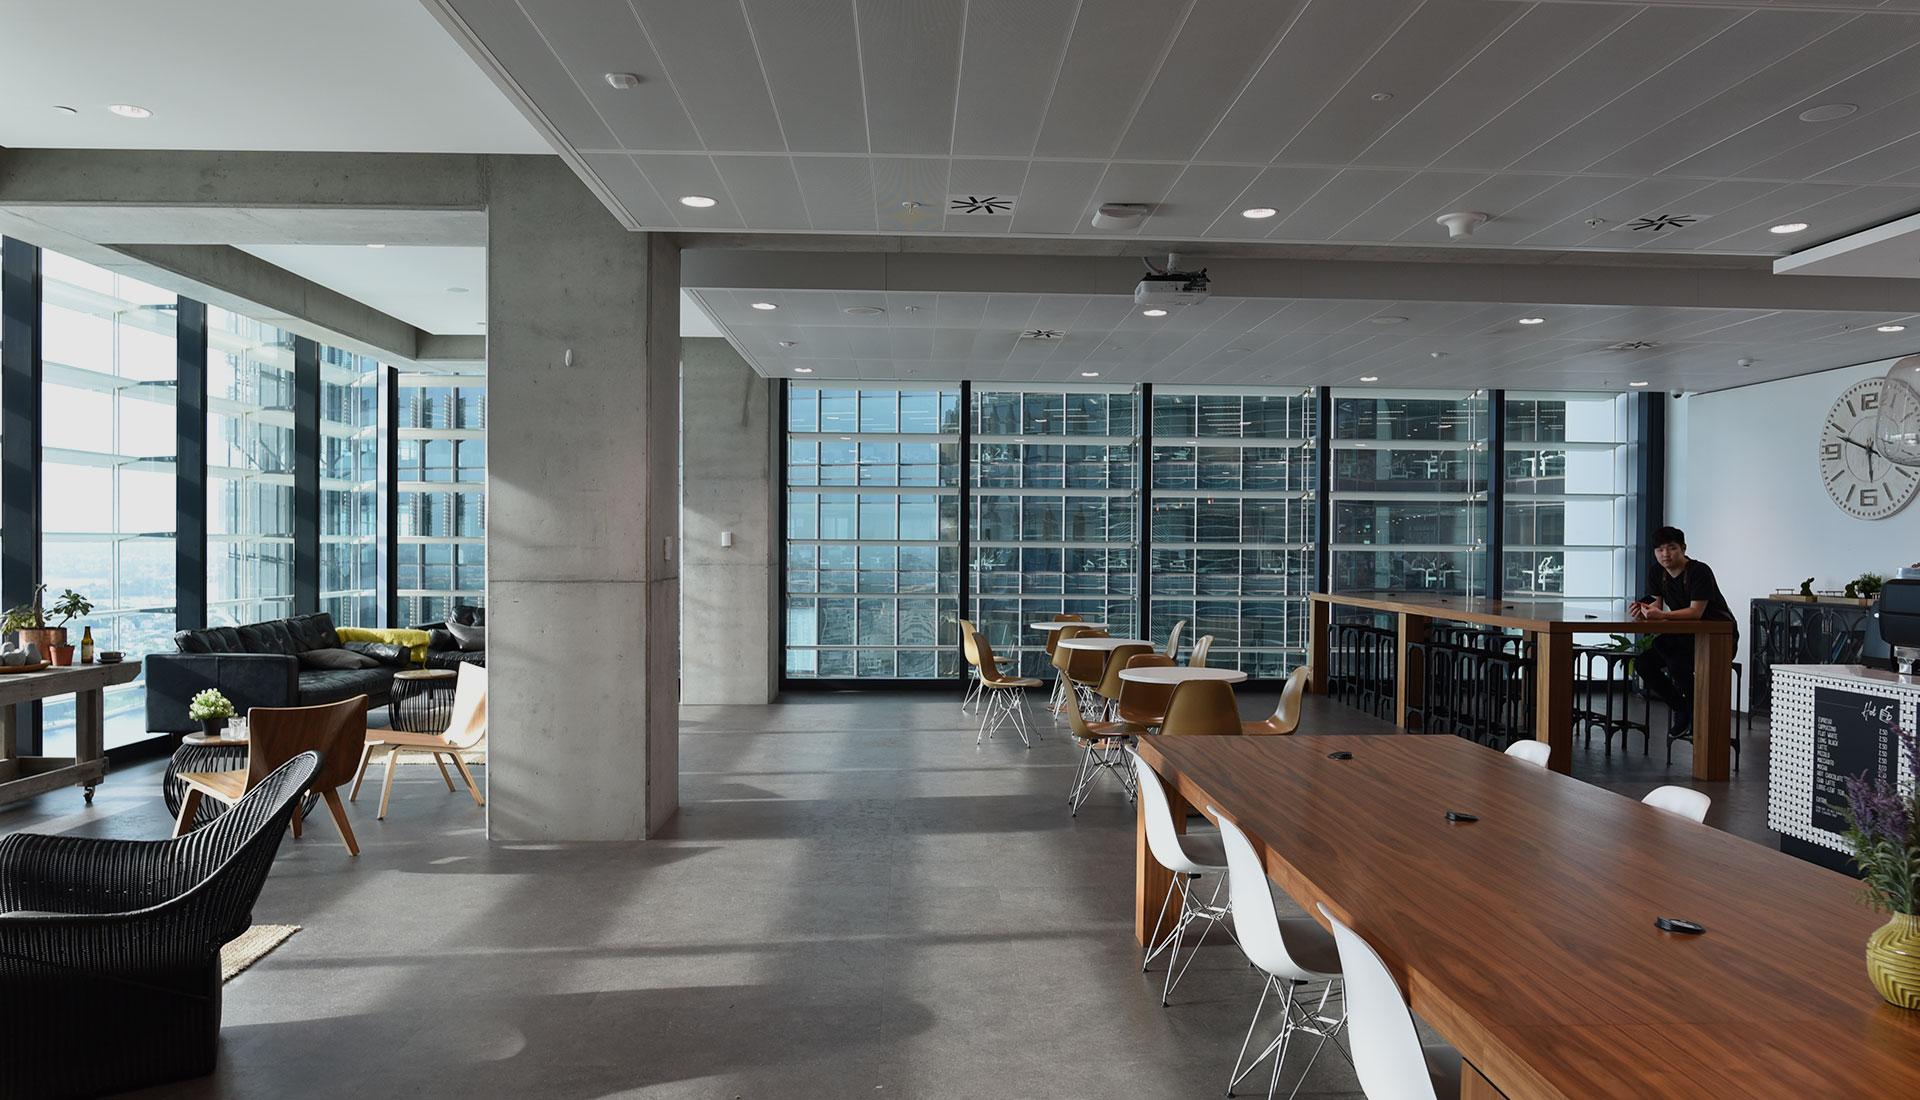 Home - The Executive Centre